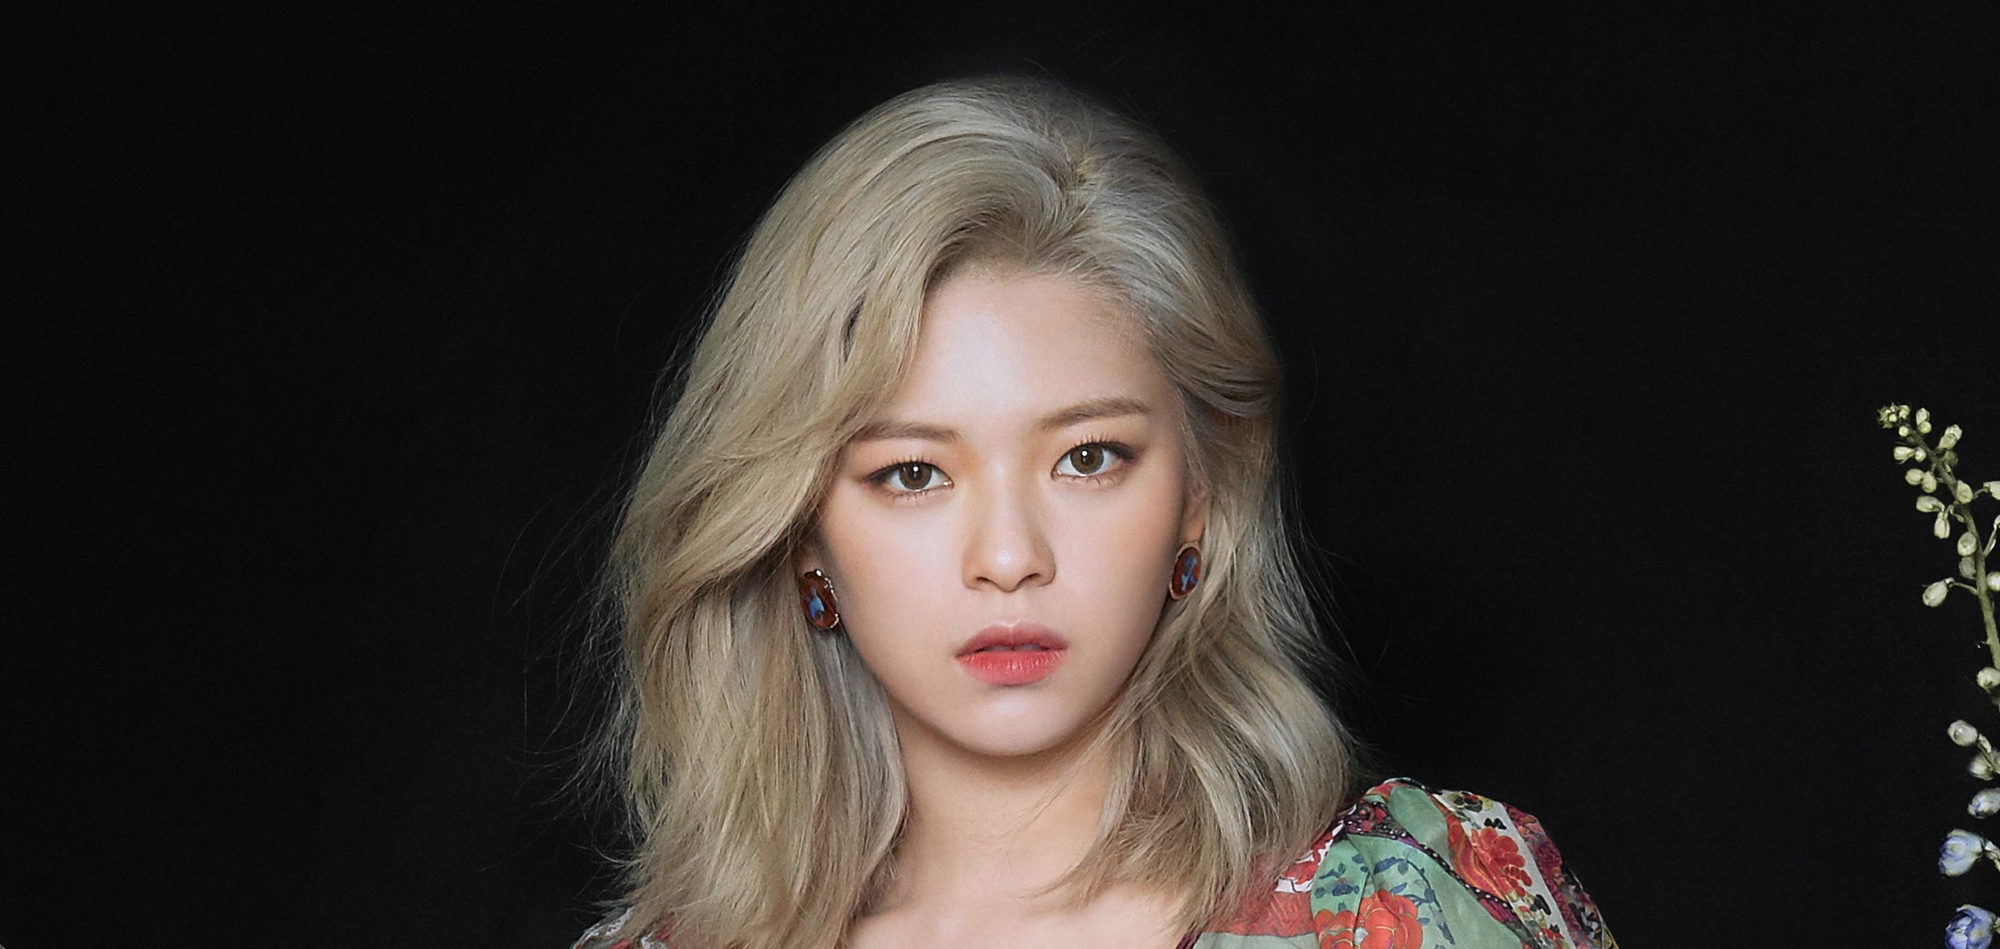 Twice Jeongyeon profile